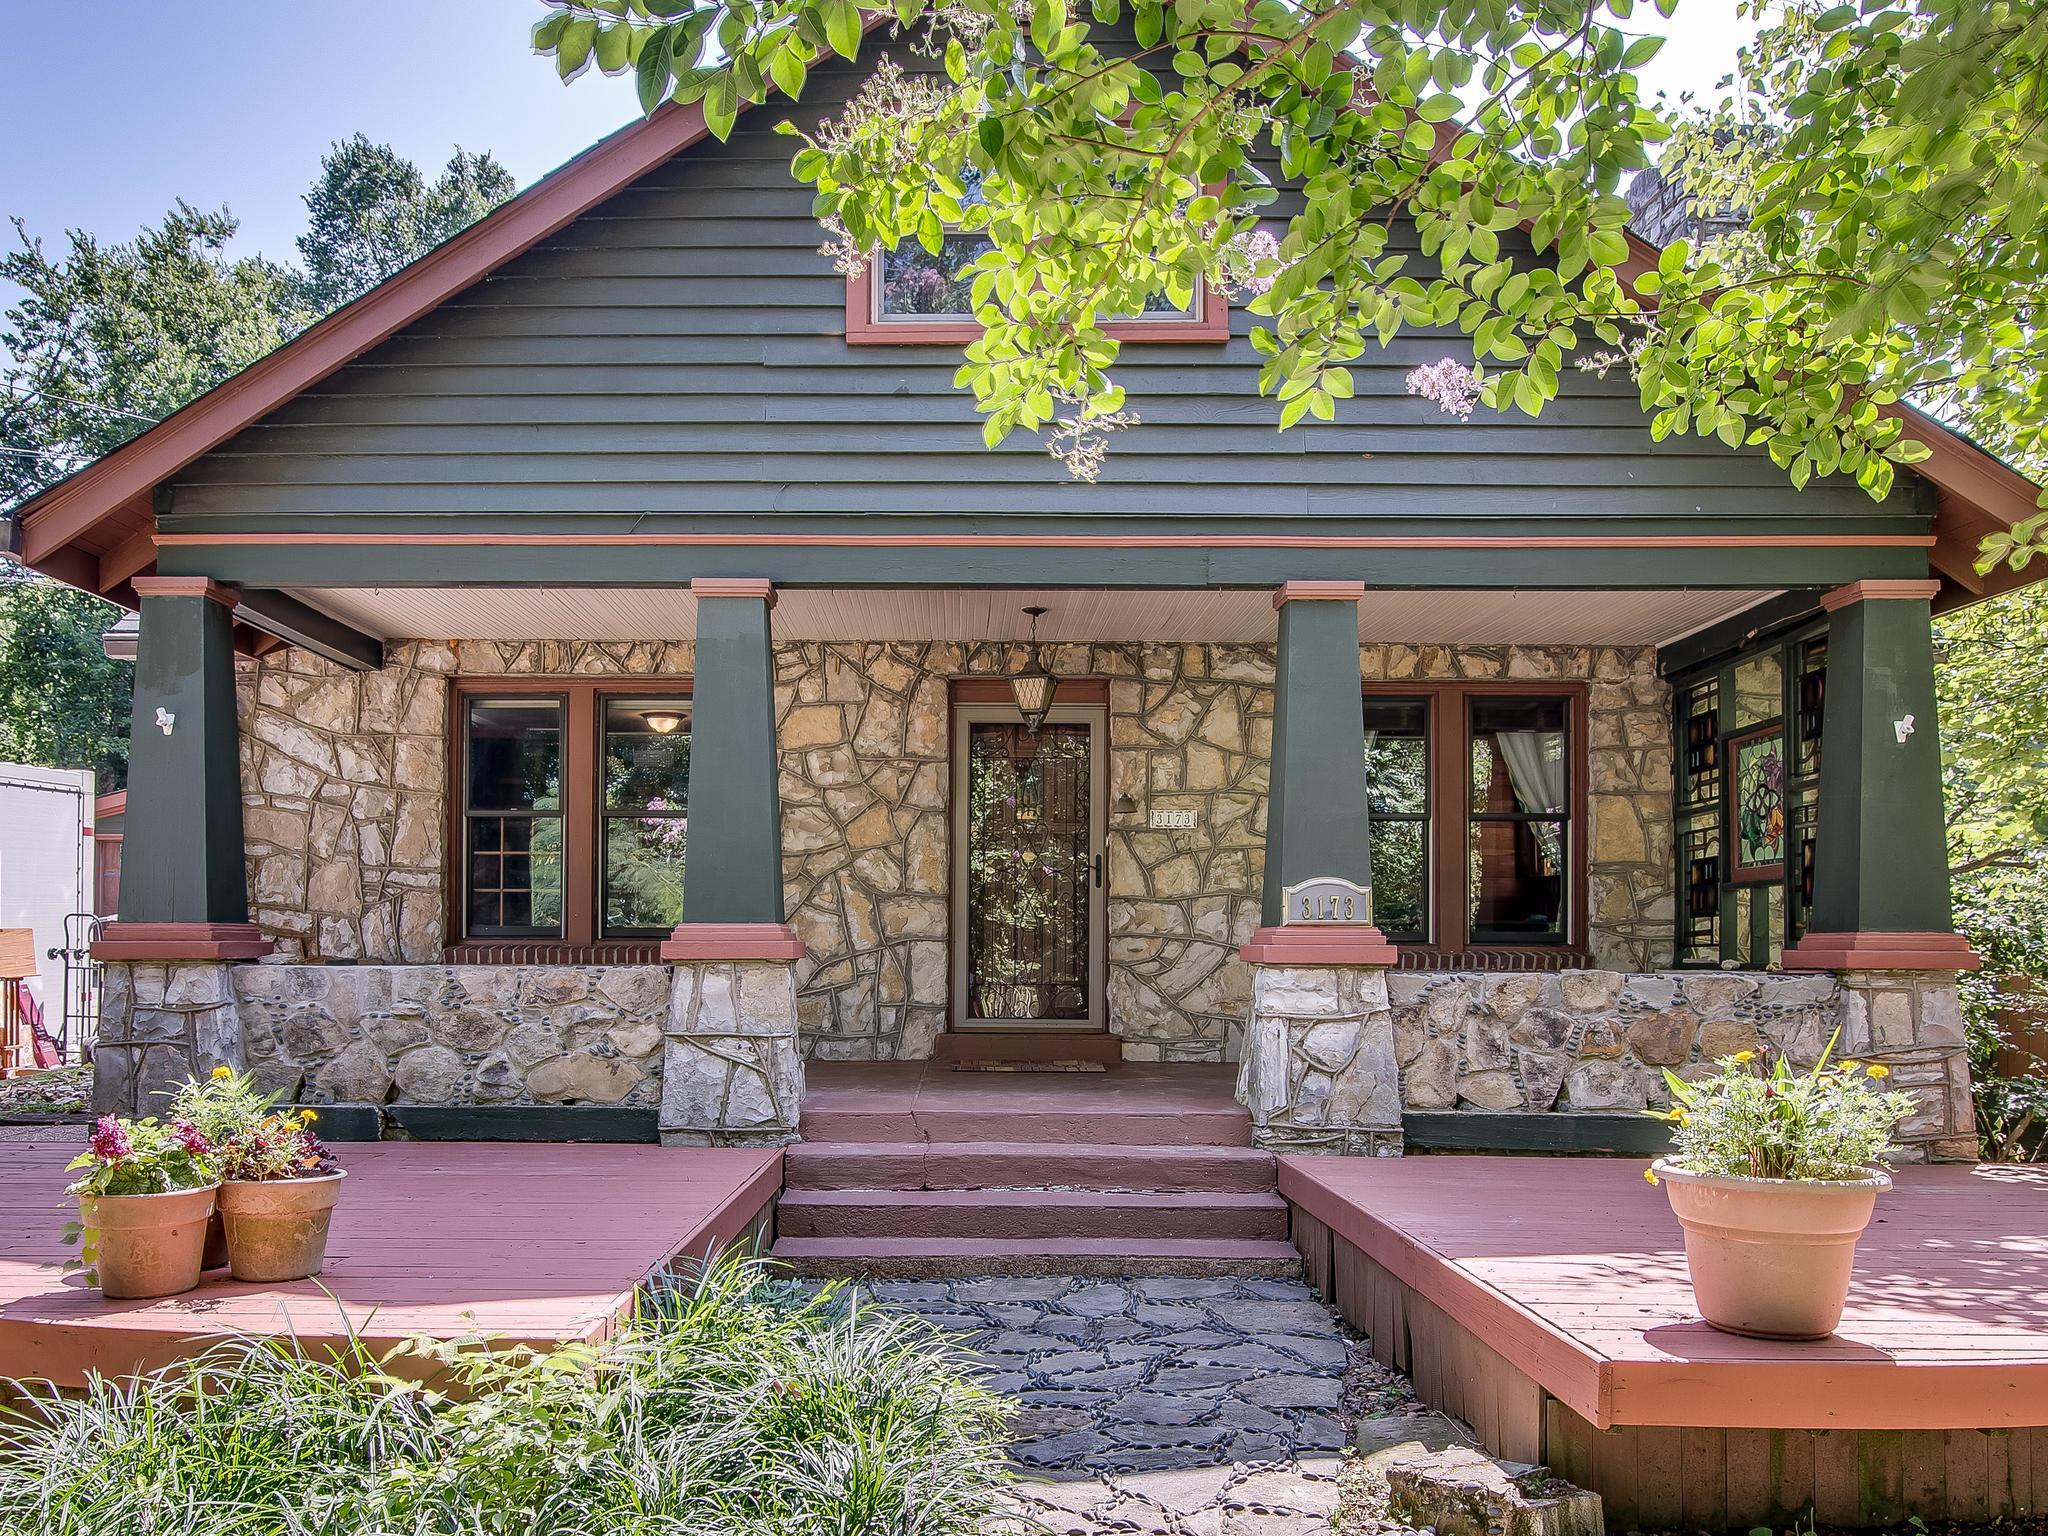 3173 Earhart Rd, Hermitage, TN 37076 - Hermitage, TN real estate listing